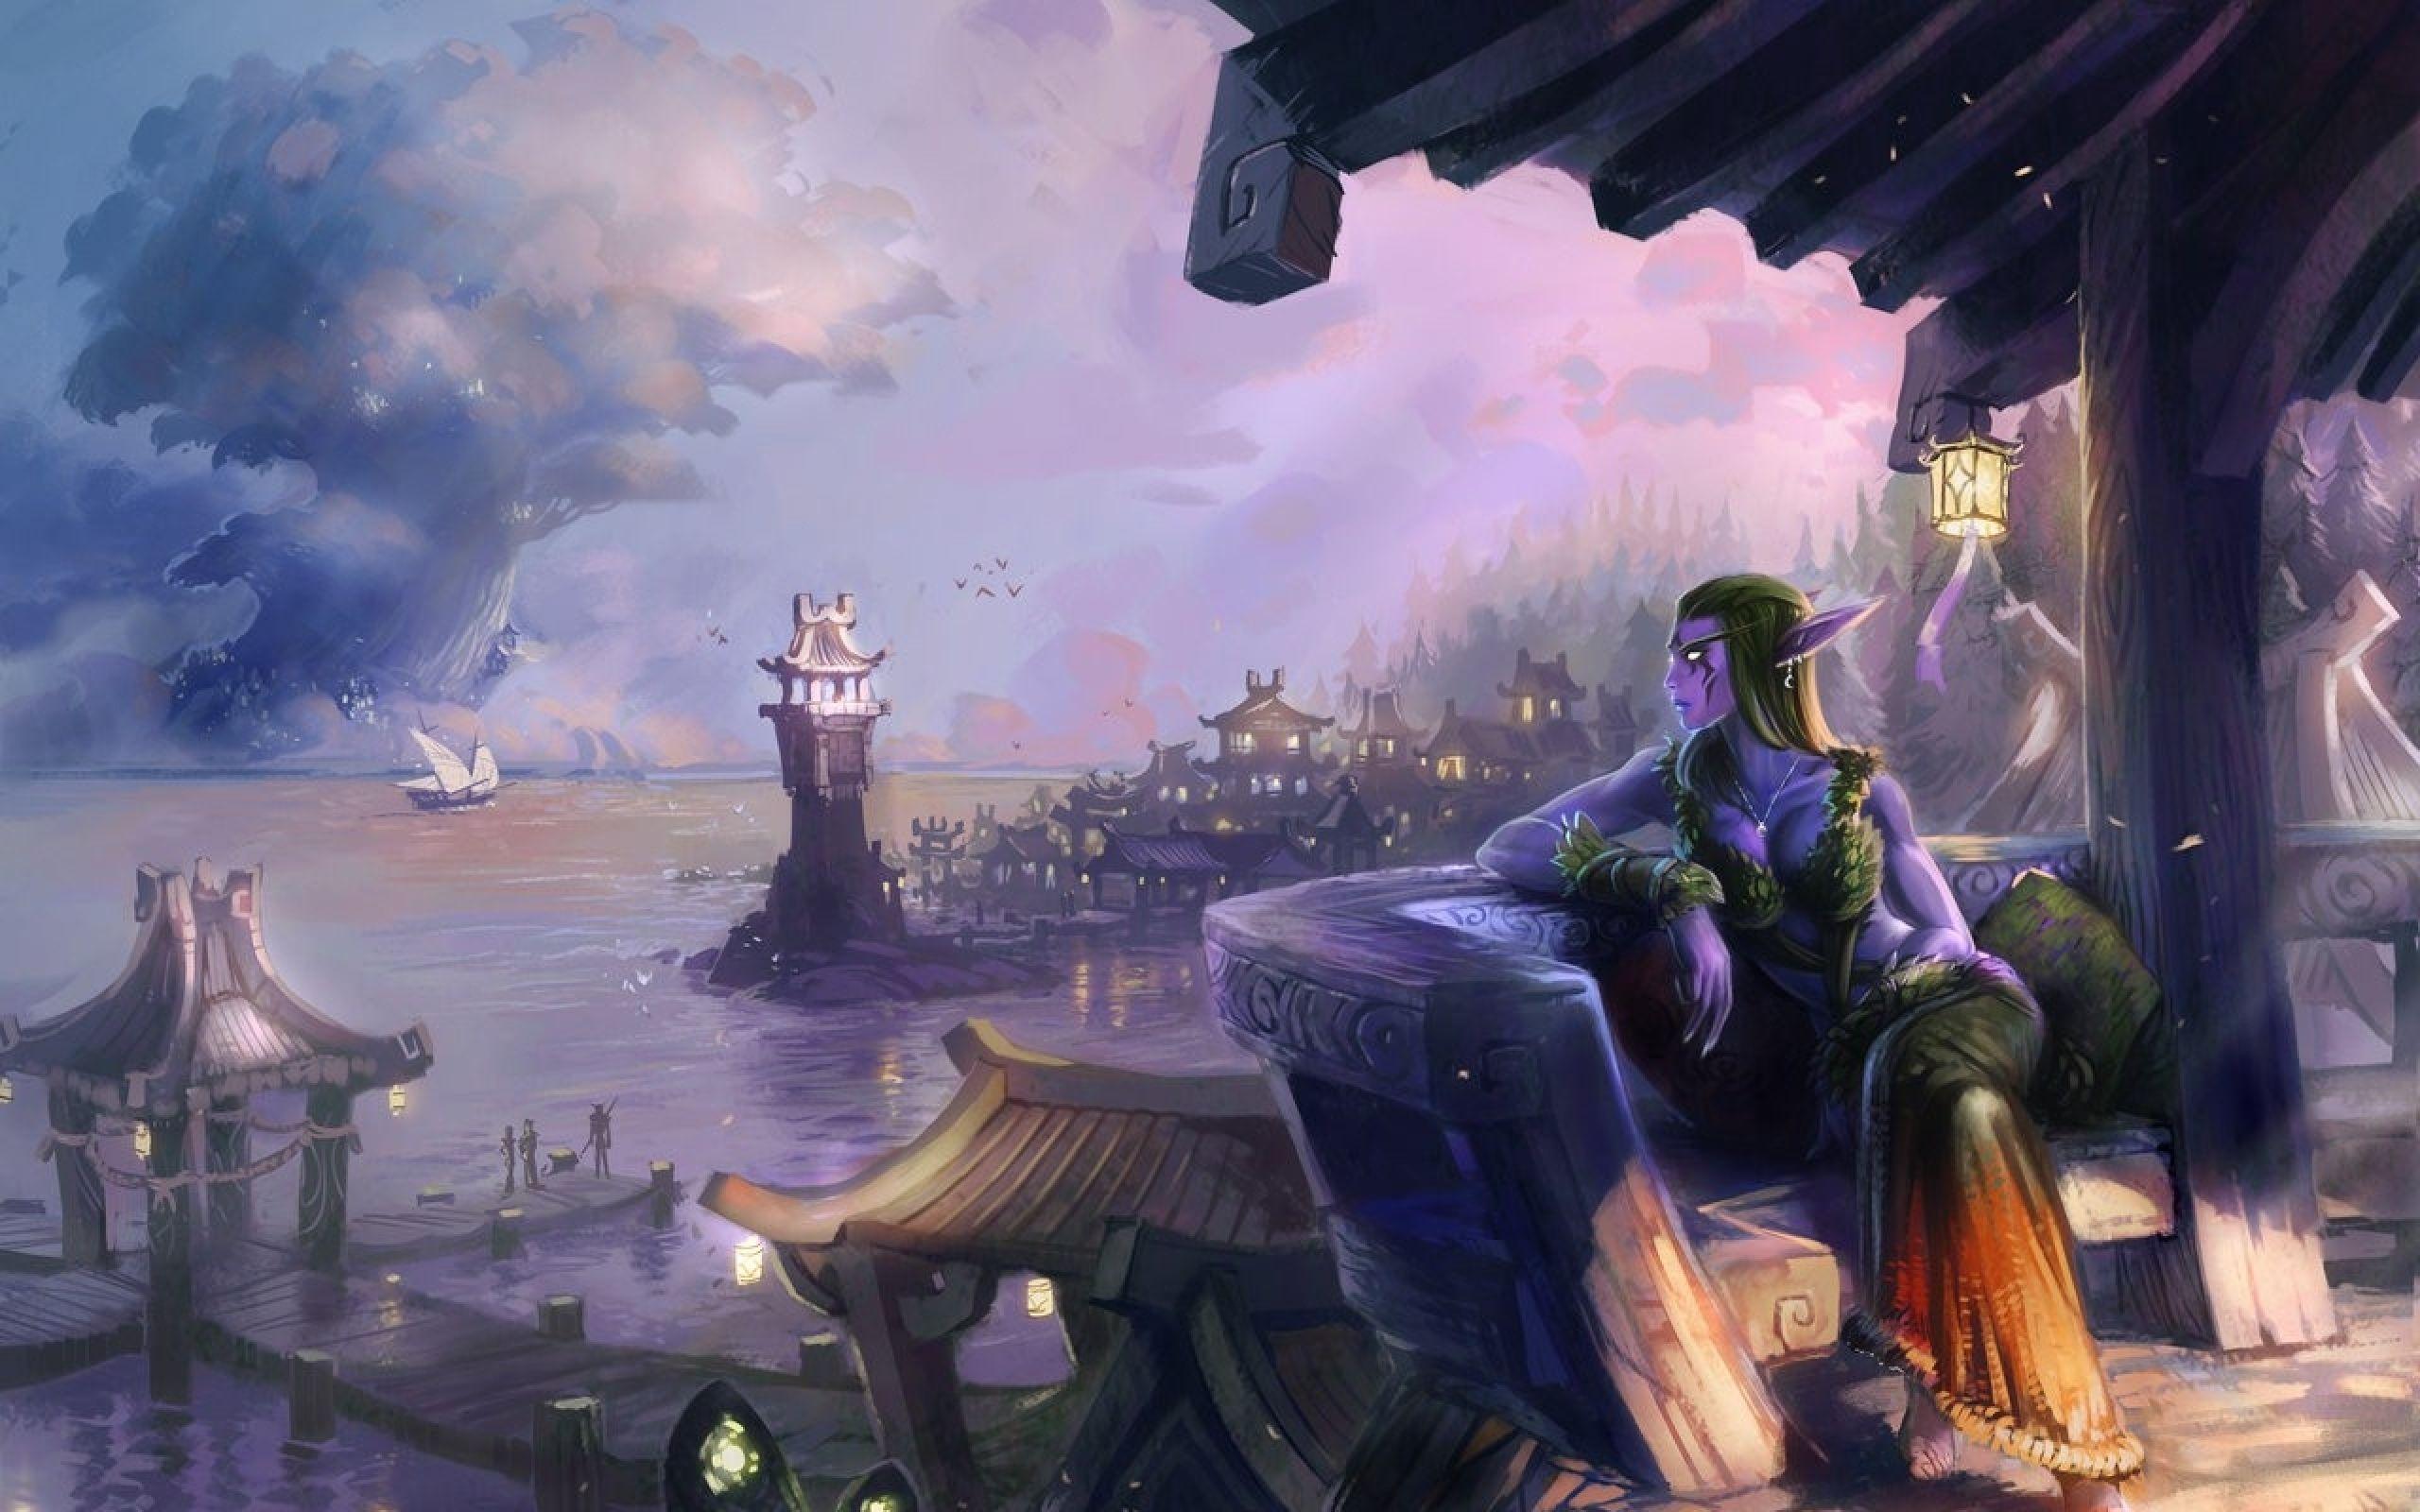 Download Wallpapers Download 2560x1600 World Of Warcraft Artwork Afternoon Night Elf Darkshore 1280x899 World Of Warcraft Game Warcraft Art World Of Warcraft